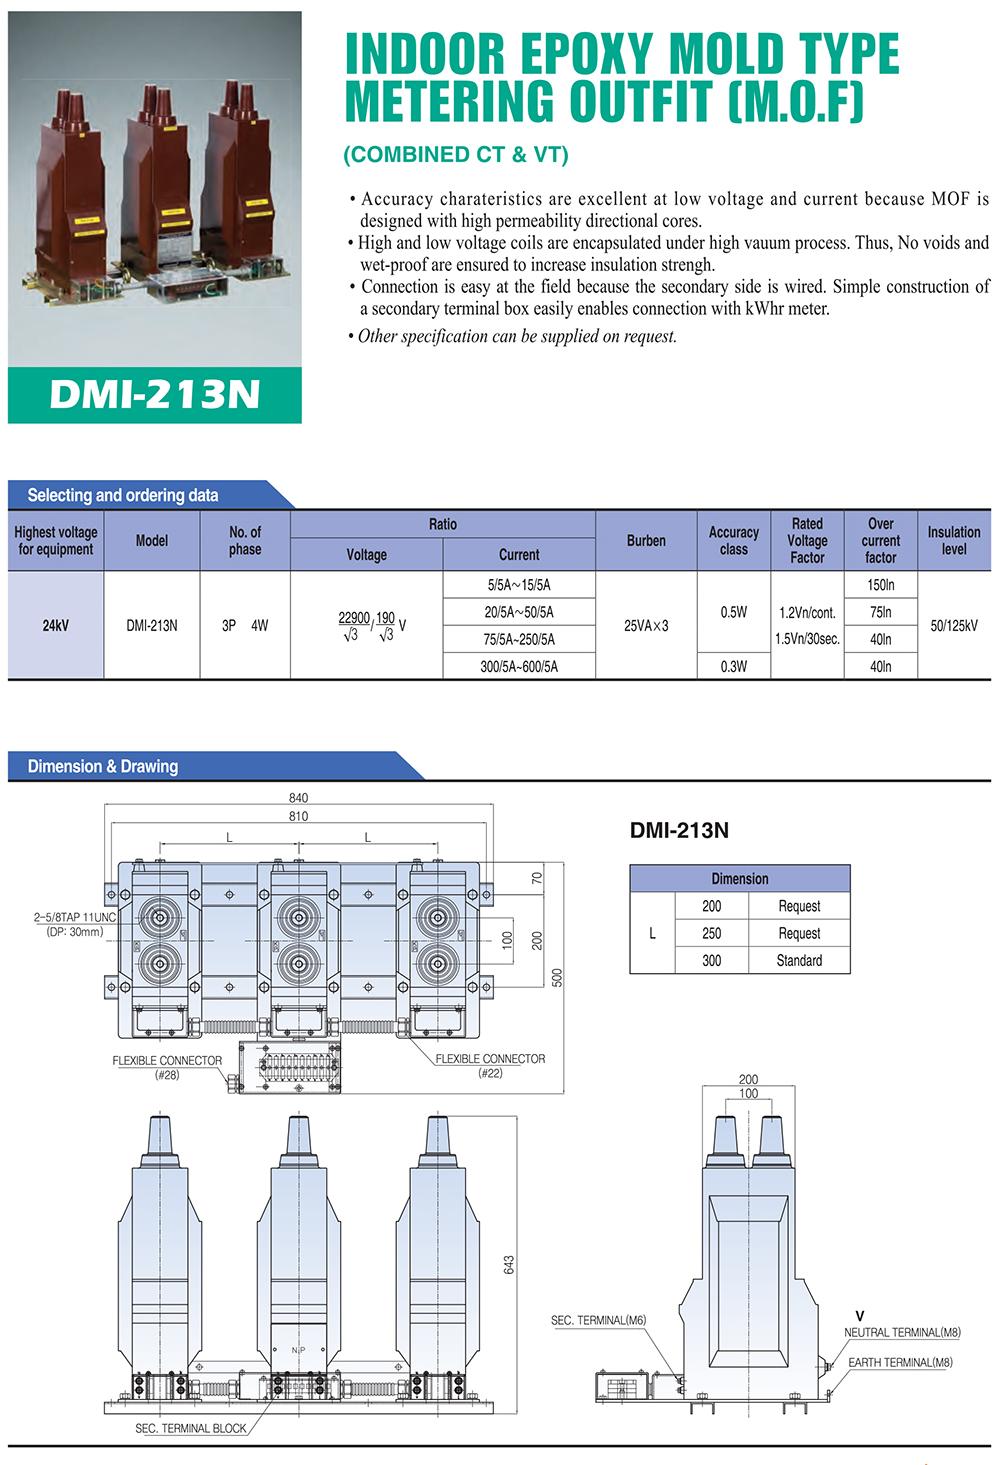 DONGWOO Indoor Epoxy Mold type MOF DMI-213N